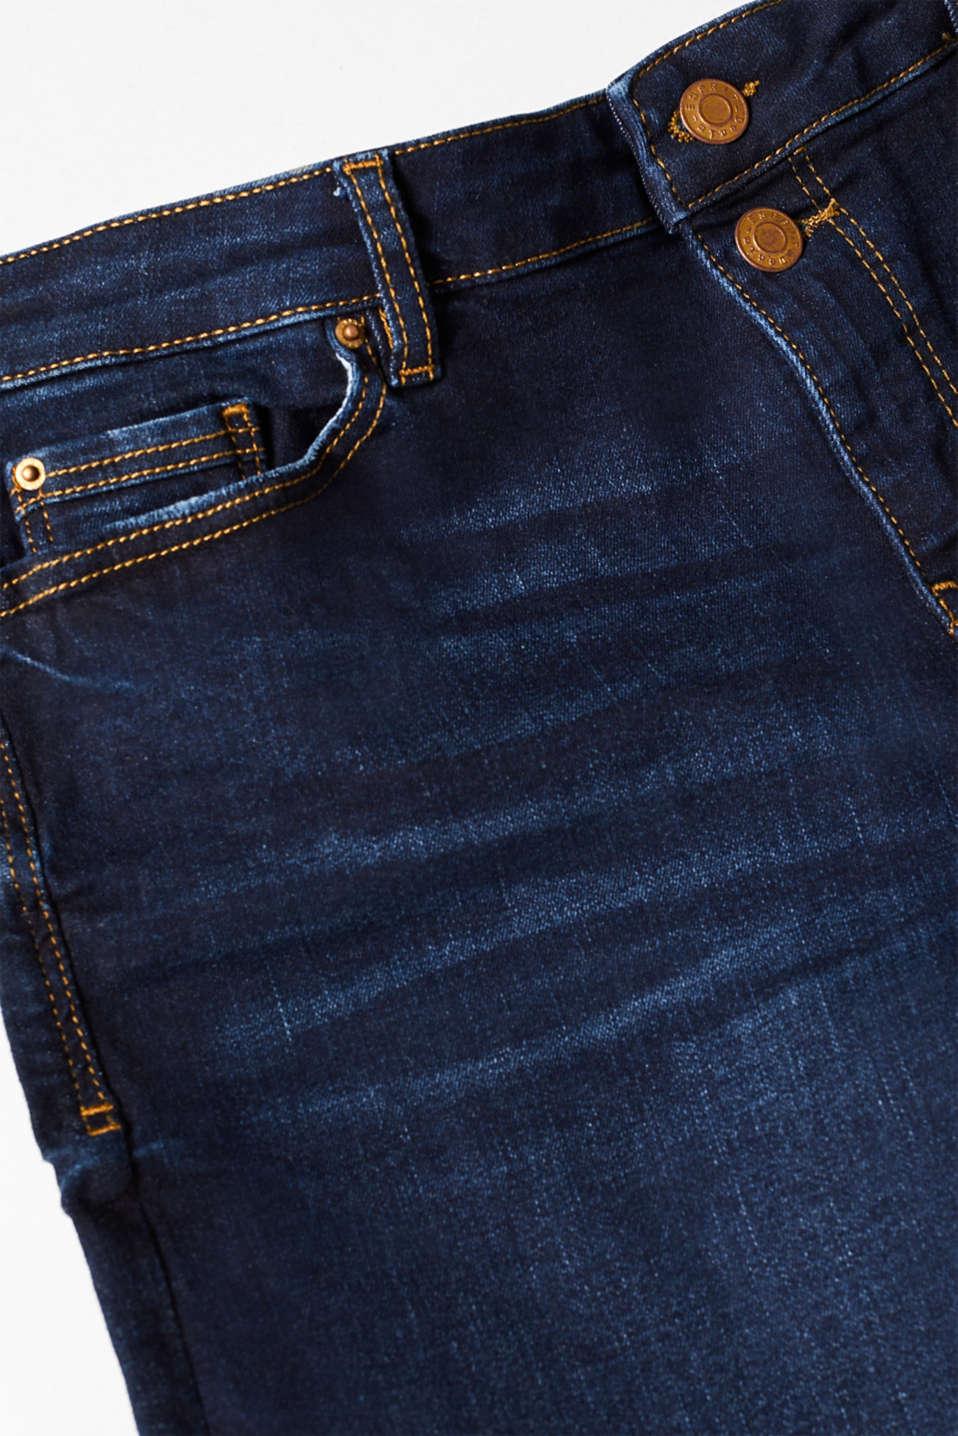 Shorts denim, BLUE DARK WASH, detail image number 4